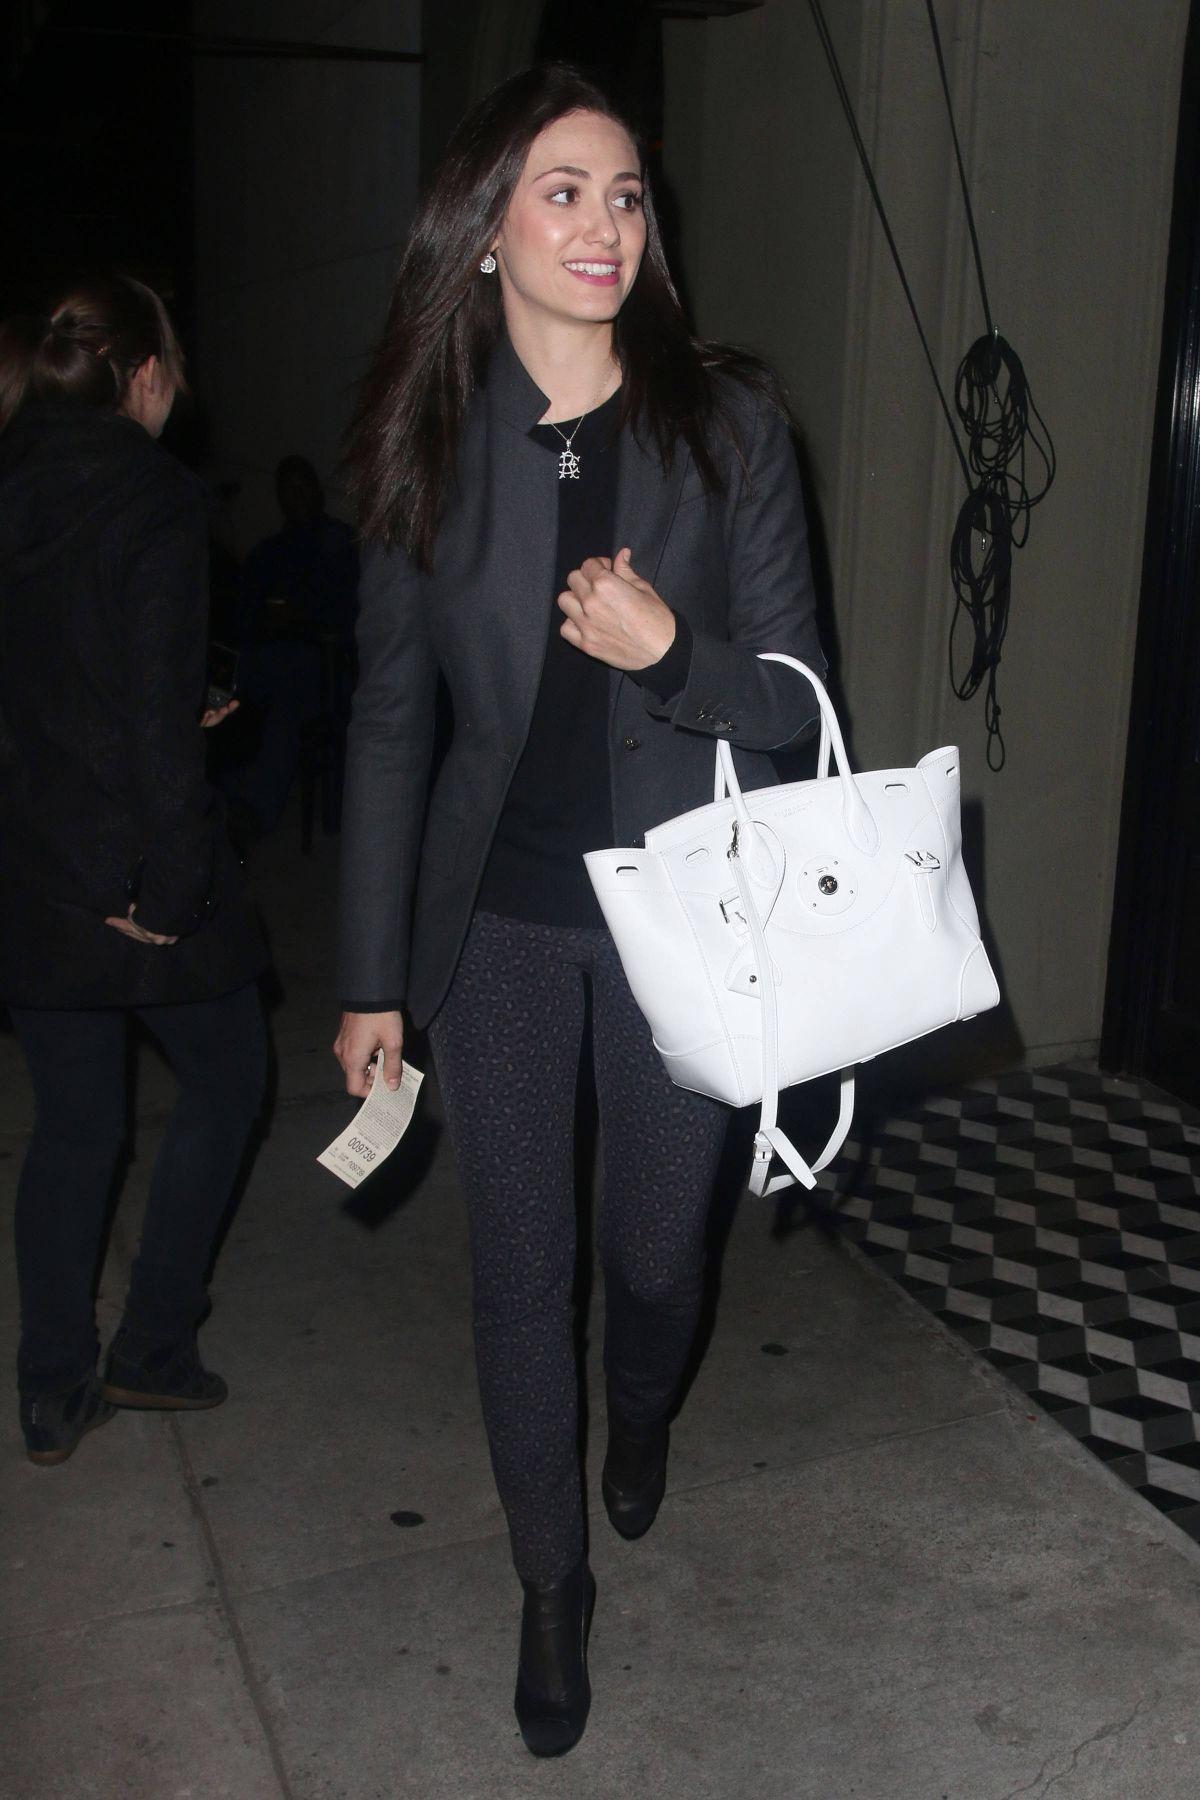 a2cade9394 Emmy Rossum wearing Ralph Lauren Ricky bag in White